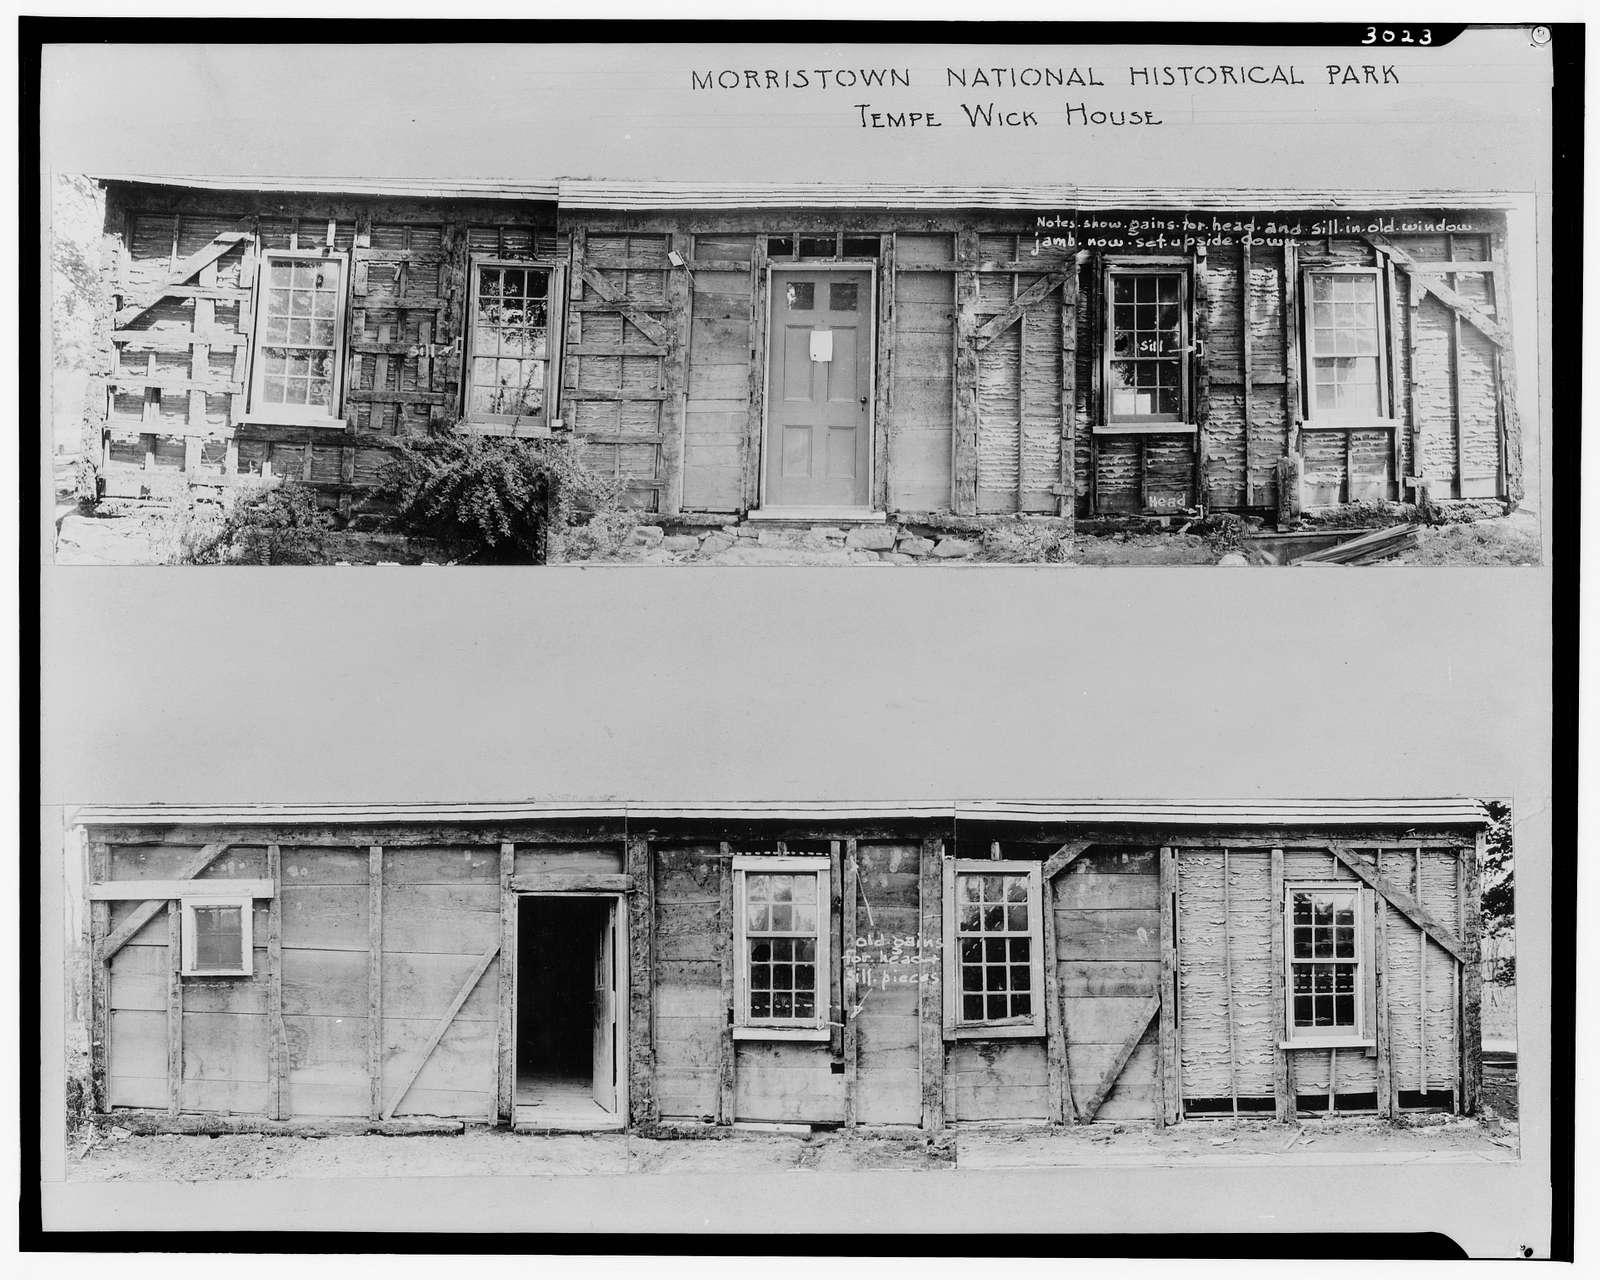 Tempe Wick House, Mendham Road, Jockey Hollow, Morristown, Morris County, NJ